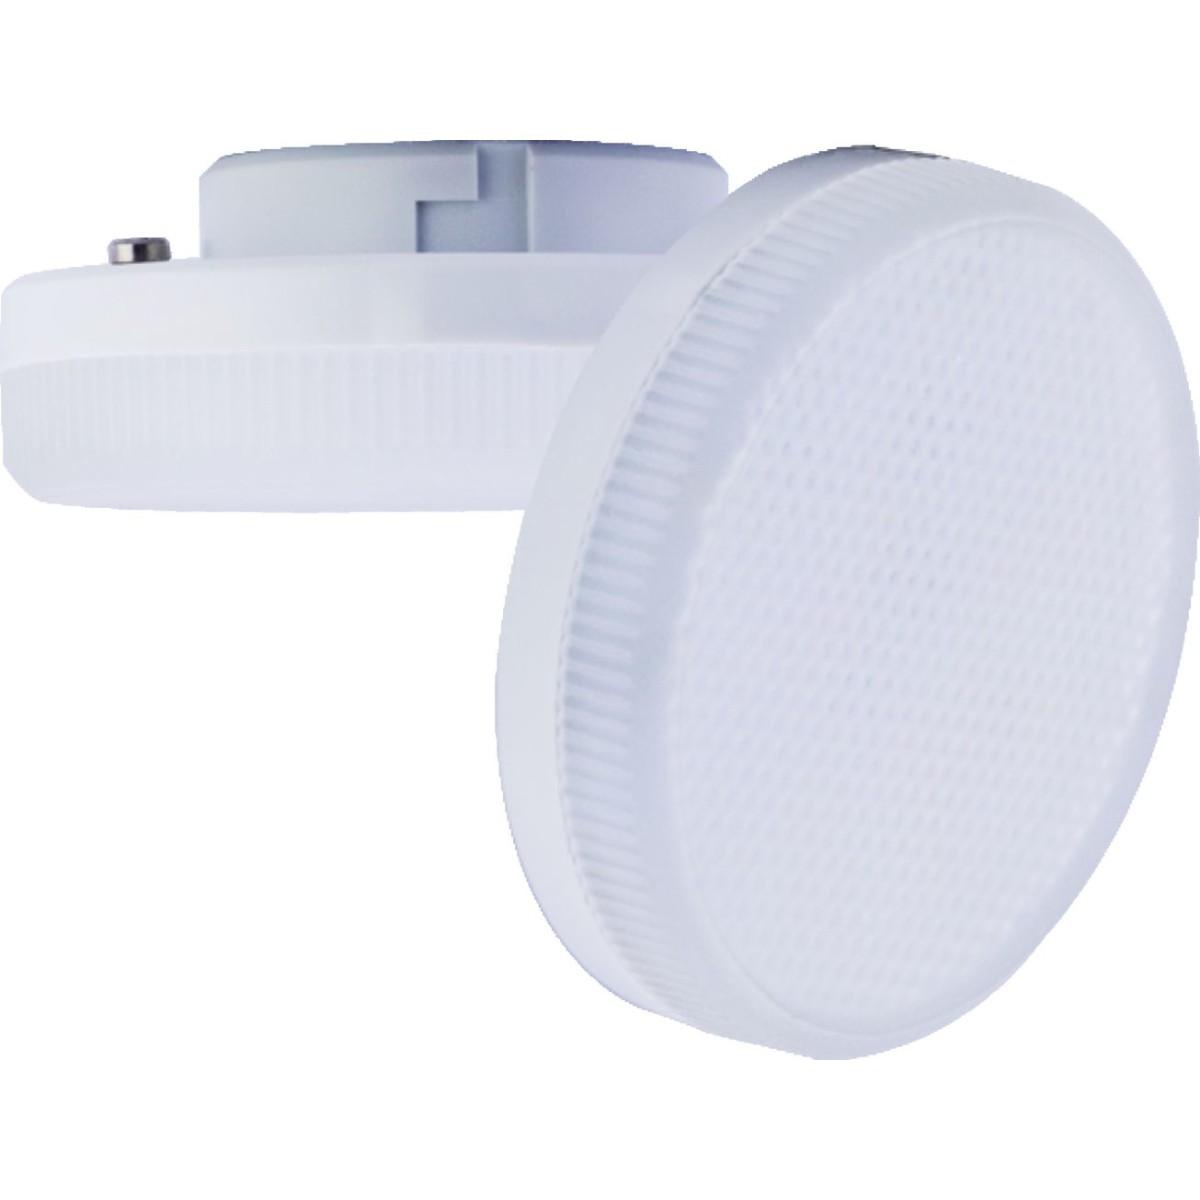 Лампа Ecola light GX53 8 Вт таблетка 640 Лм теплый 10 шт